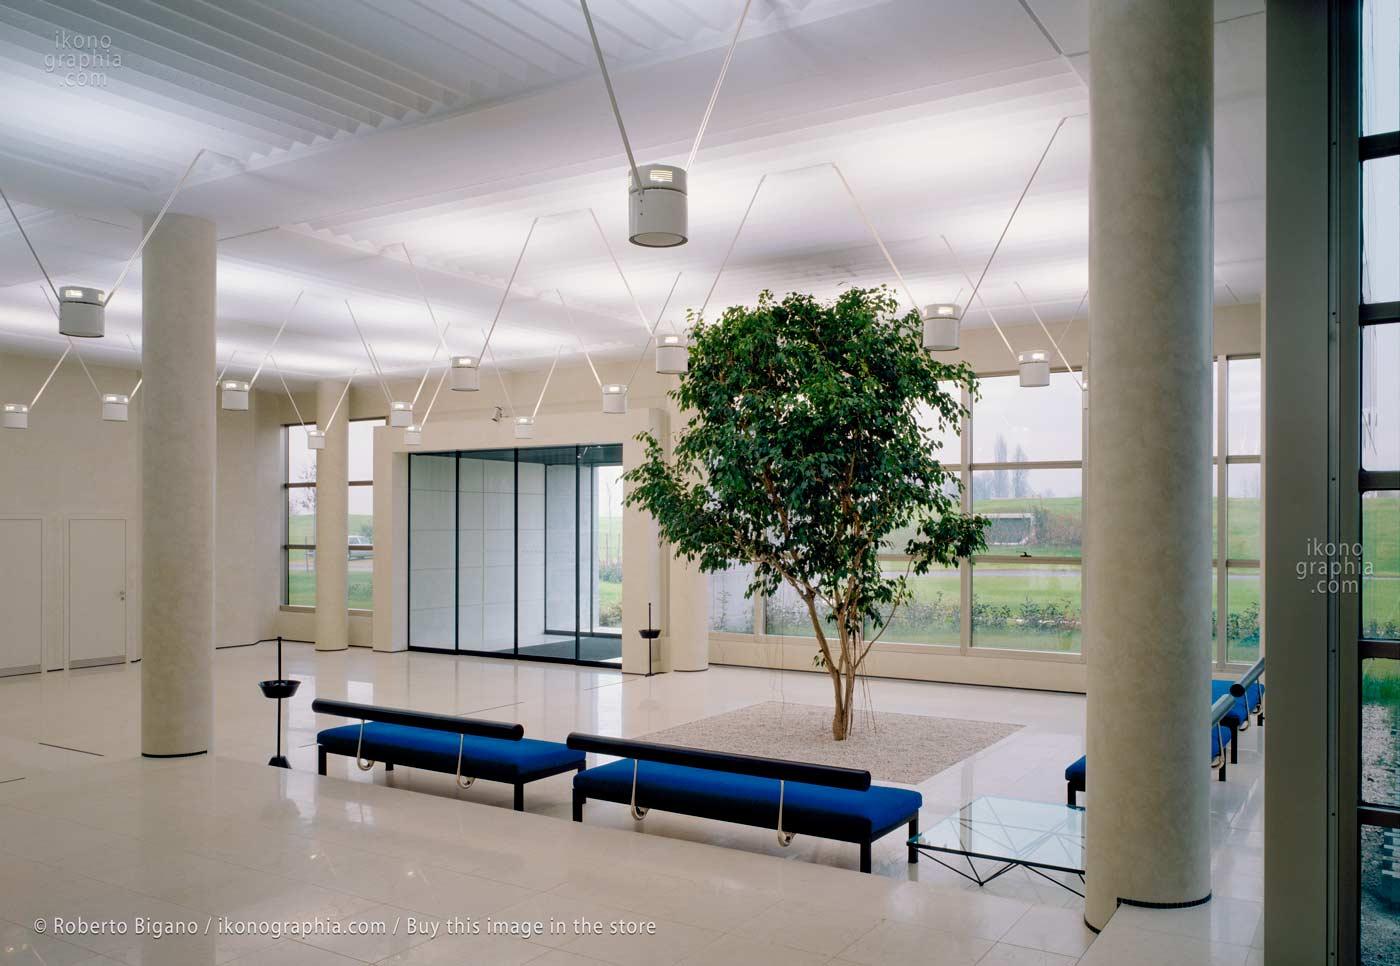 Bugatti Automobili. The large and bright luxury hall